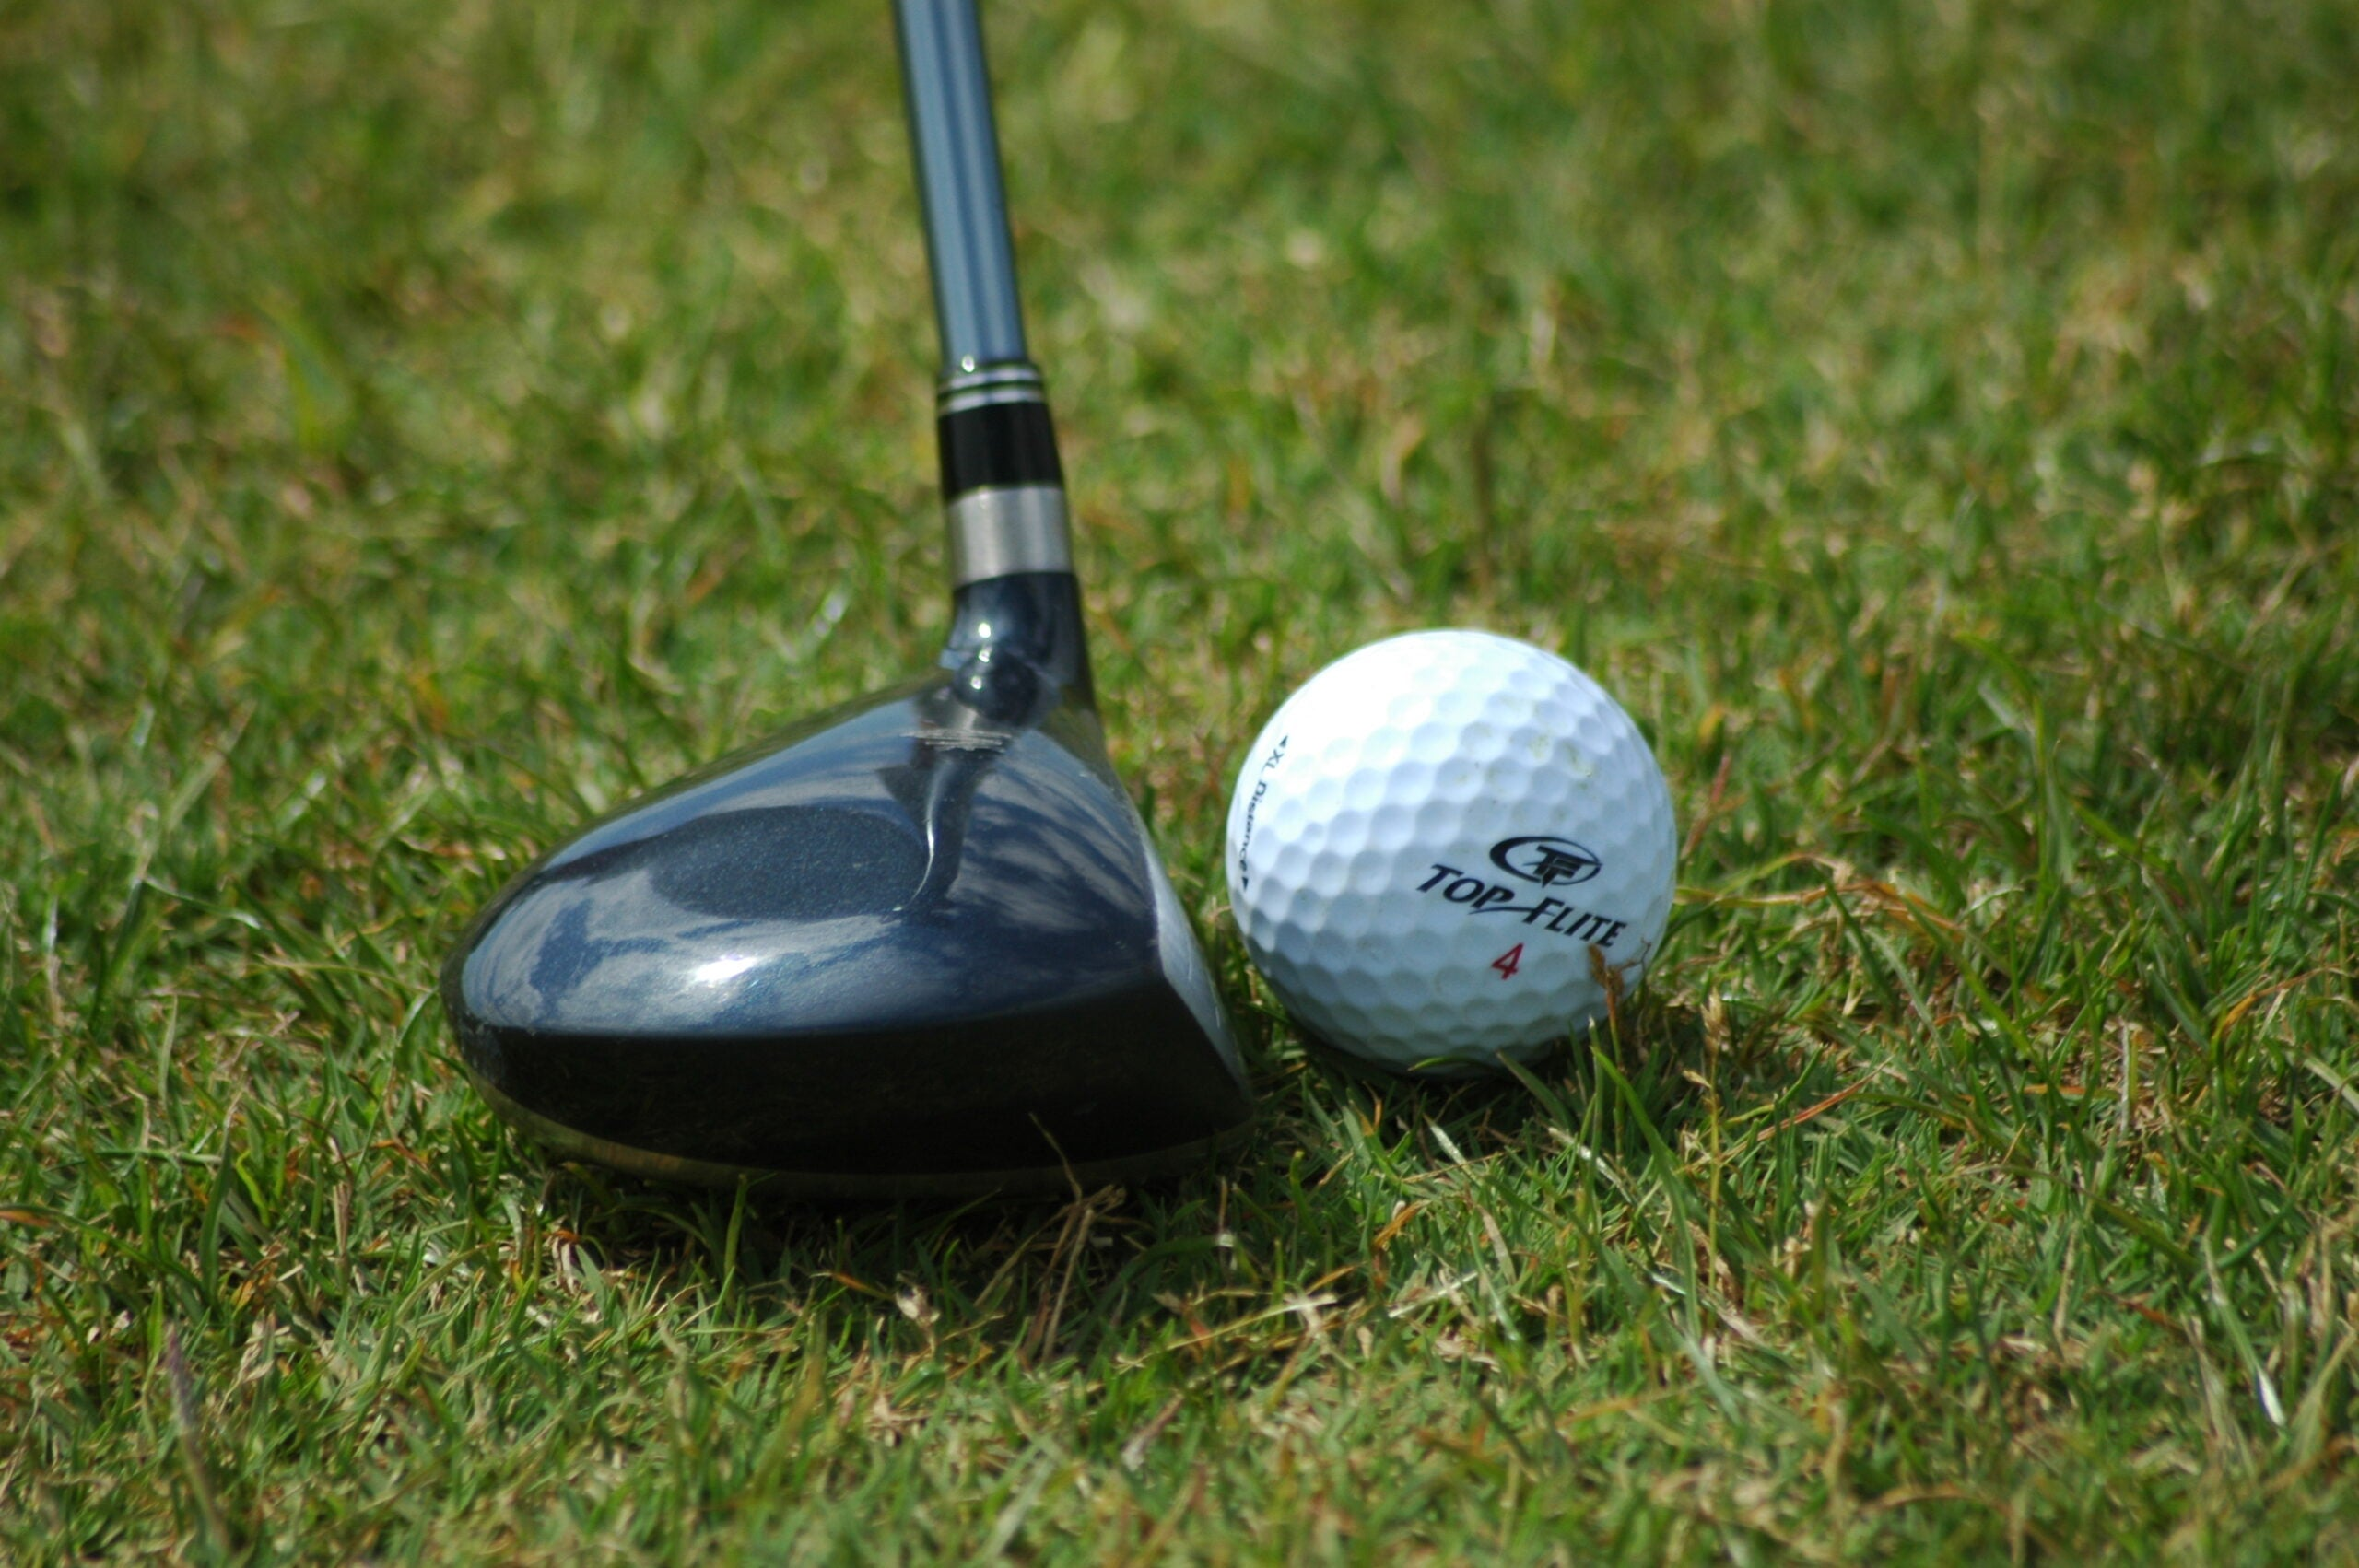 Japanese Golf Course Has A Bright Future As A Solar Farm